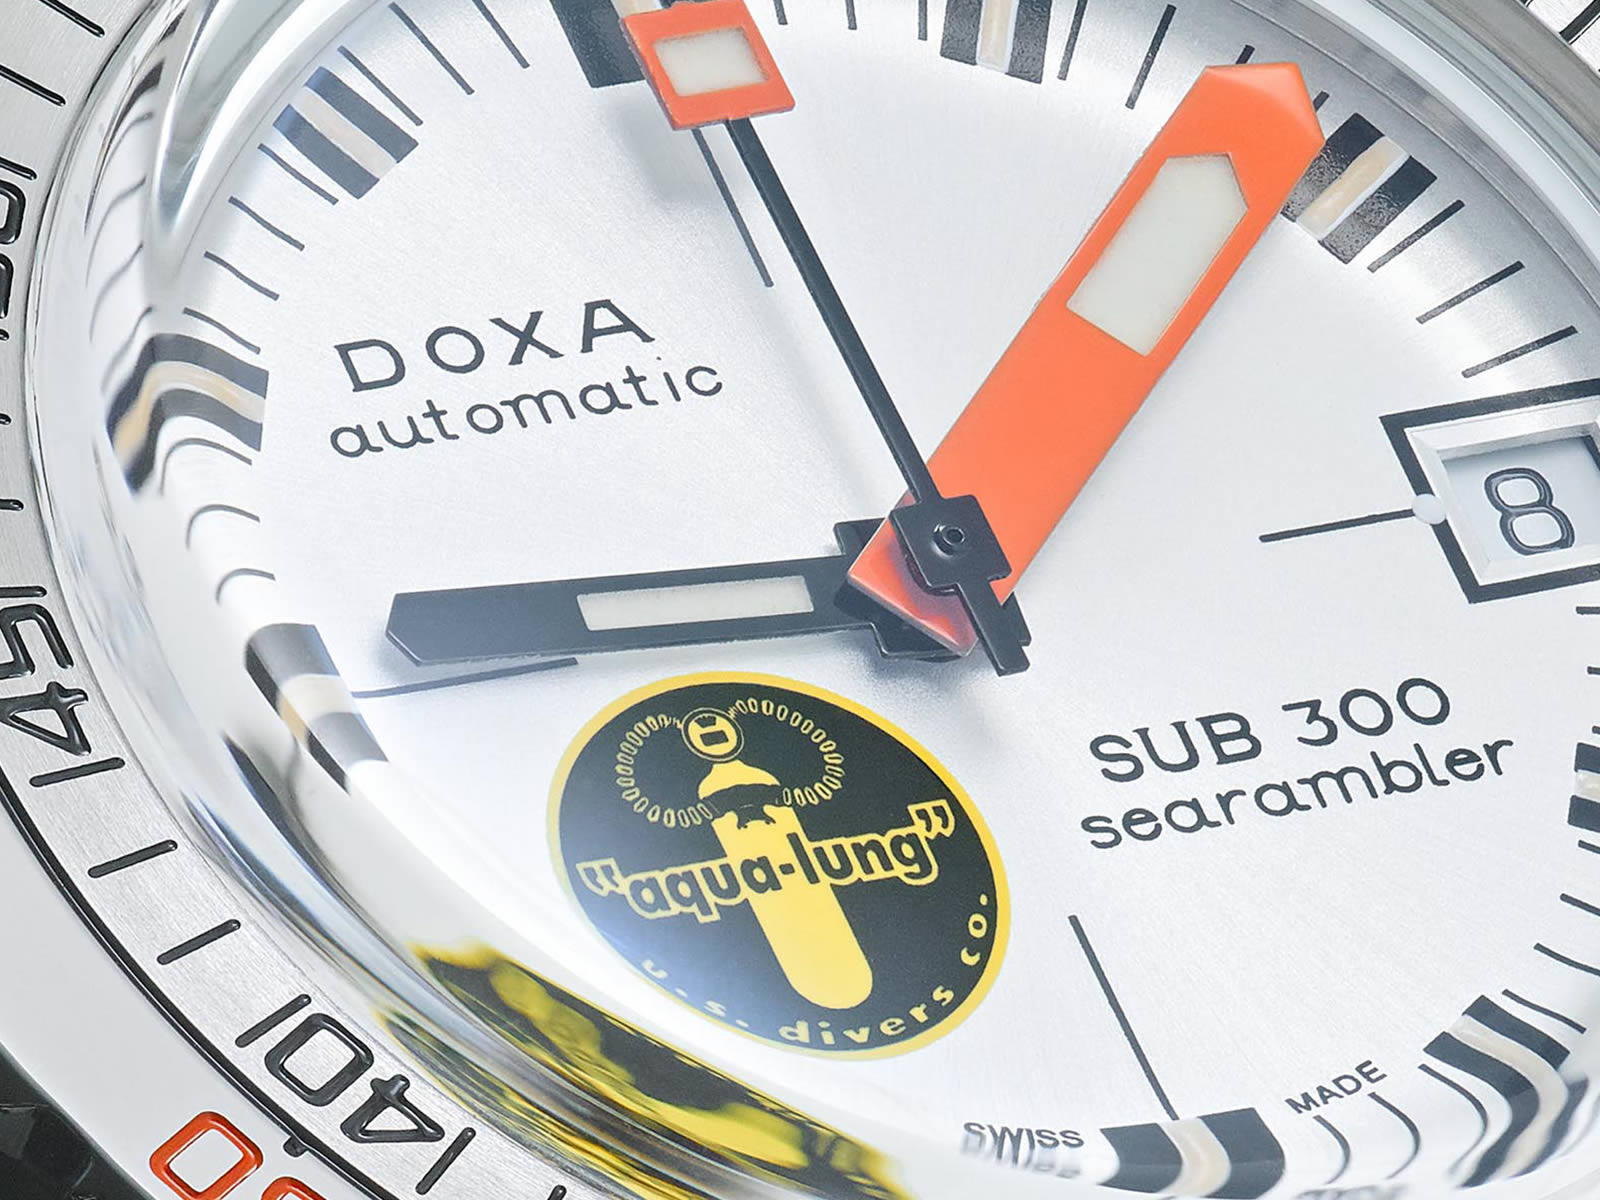 doxa-sub-300-searambler-silver-lung-5-.jpg